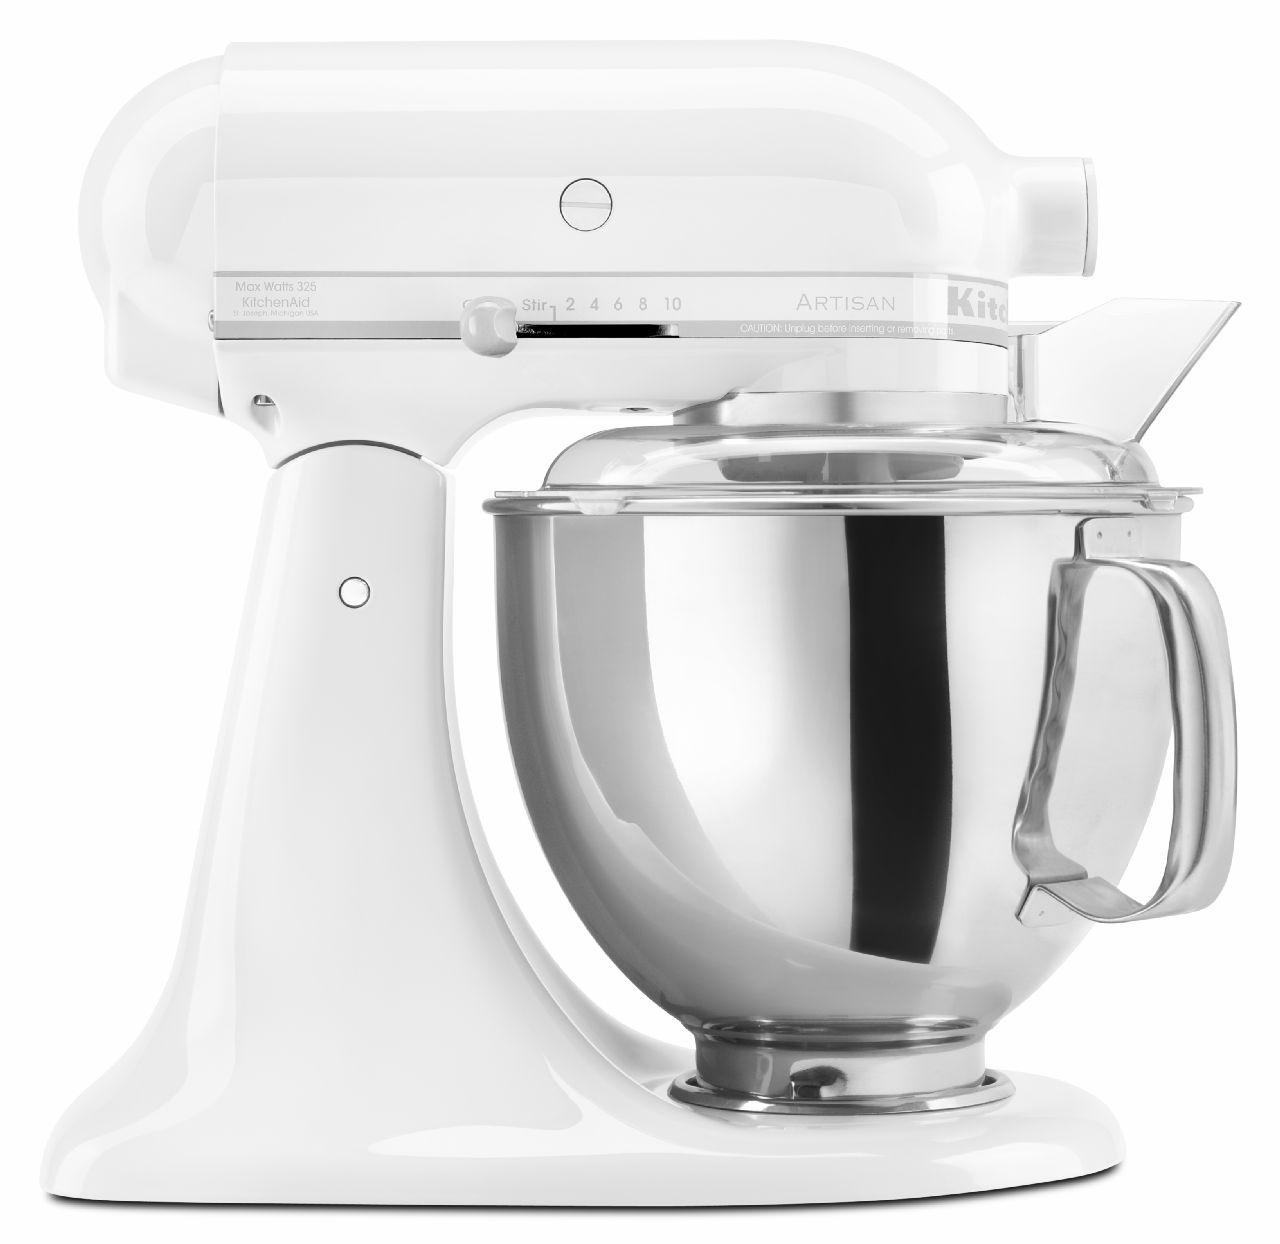 KitchenAid-Artisan-Series-5-Quart-Tilt-Head-Stand-Mixer-10-Speeds-KSM150PS thumbnail 123